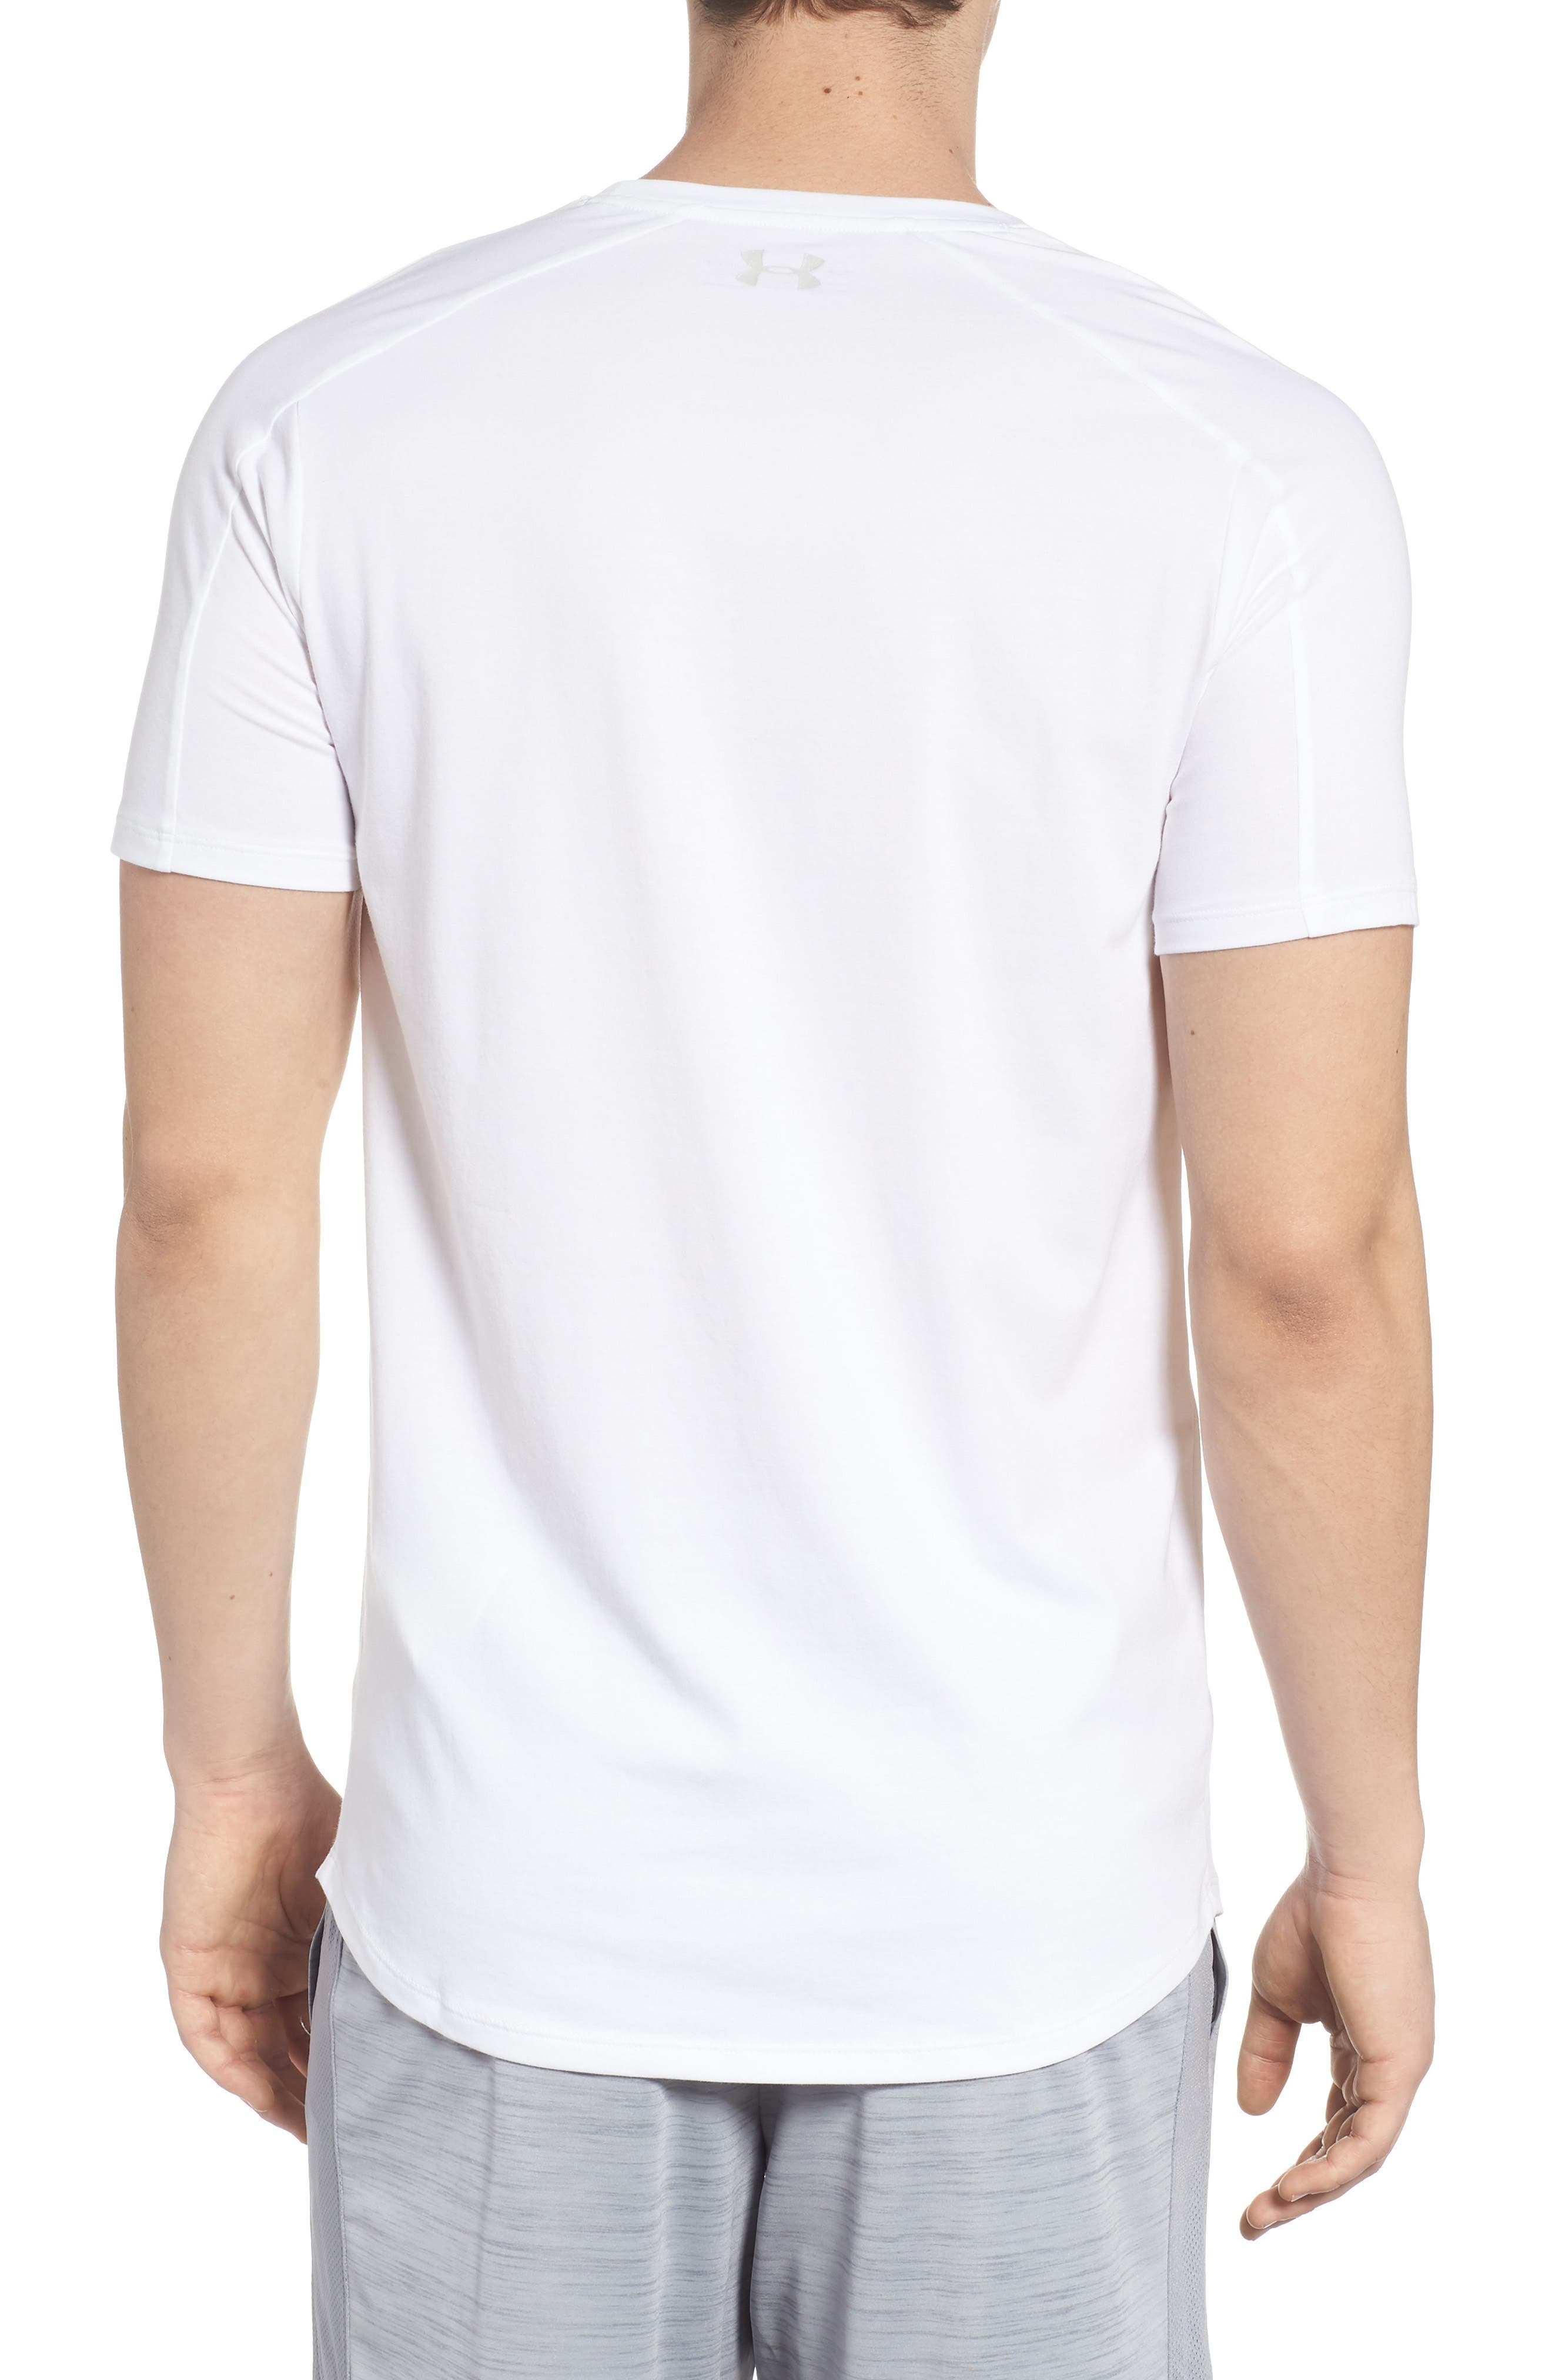 Perpetual Crewneck T-Shirt,                             Alternate thumbnail 2, color,                             White/ White